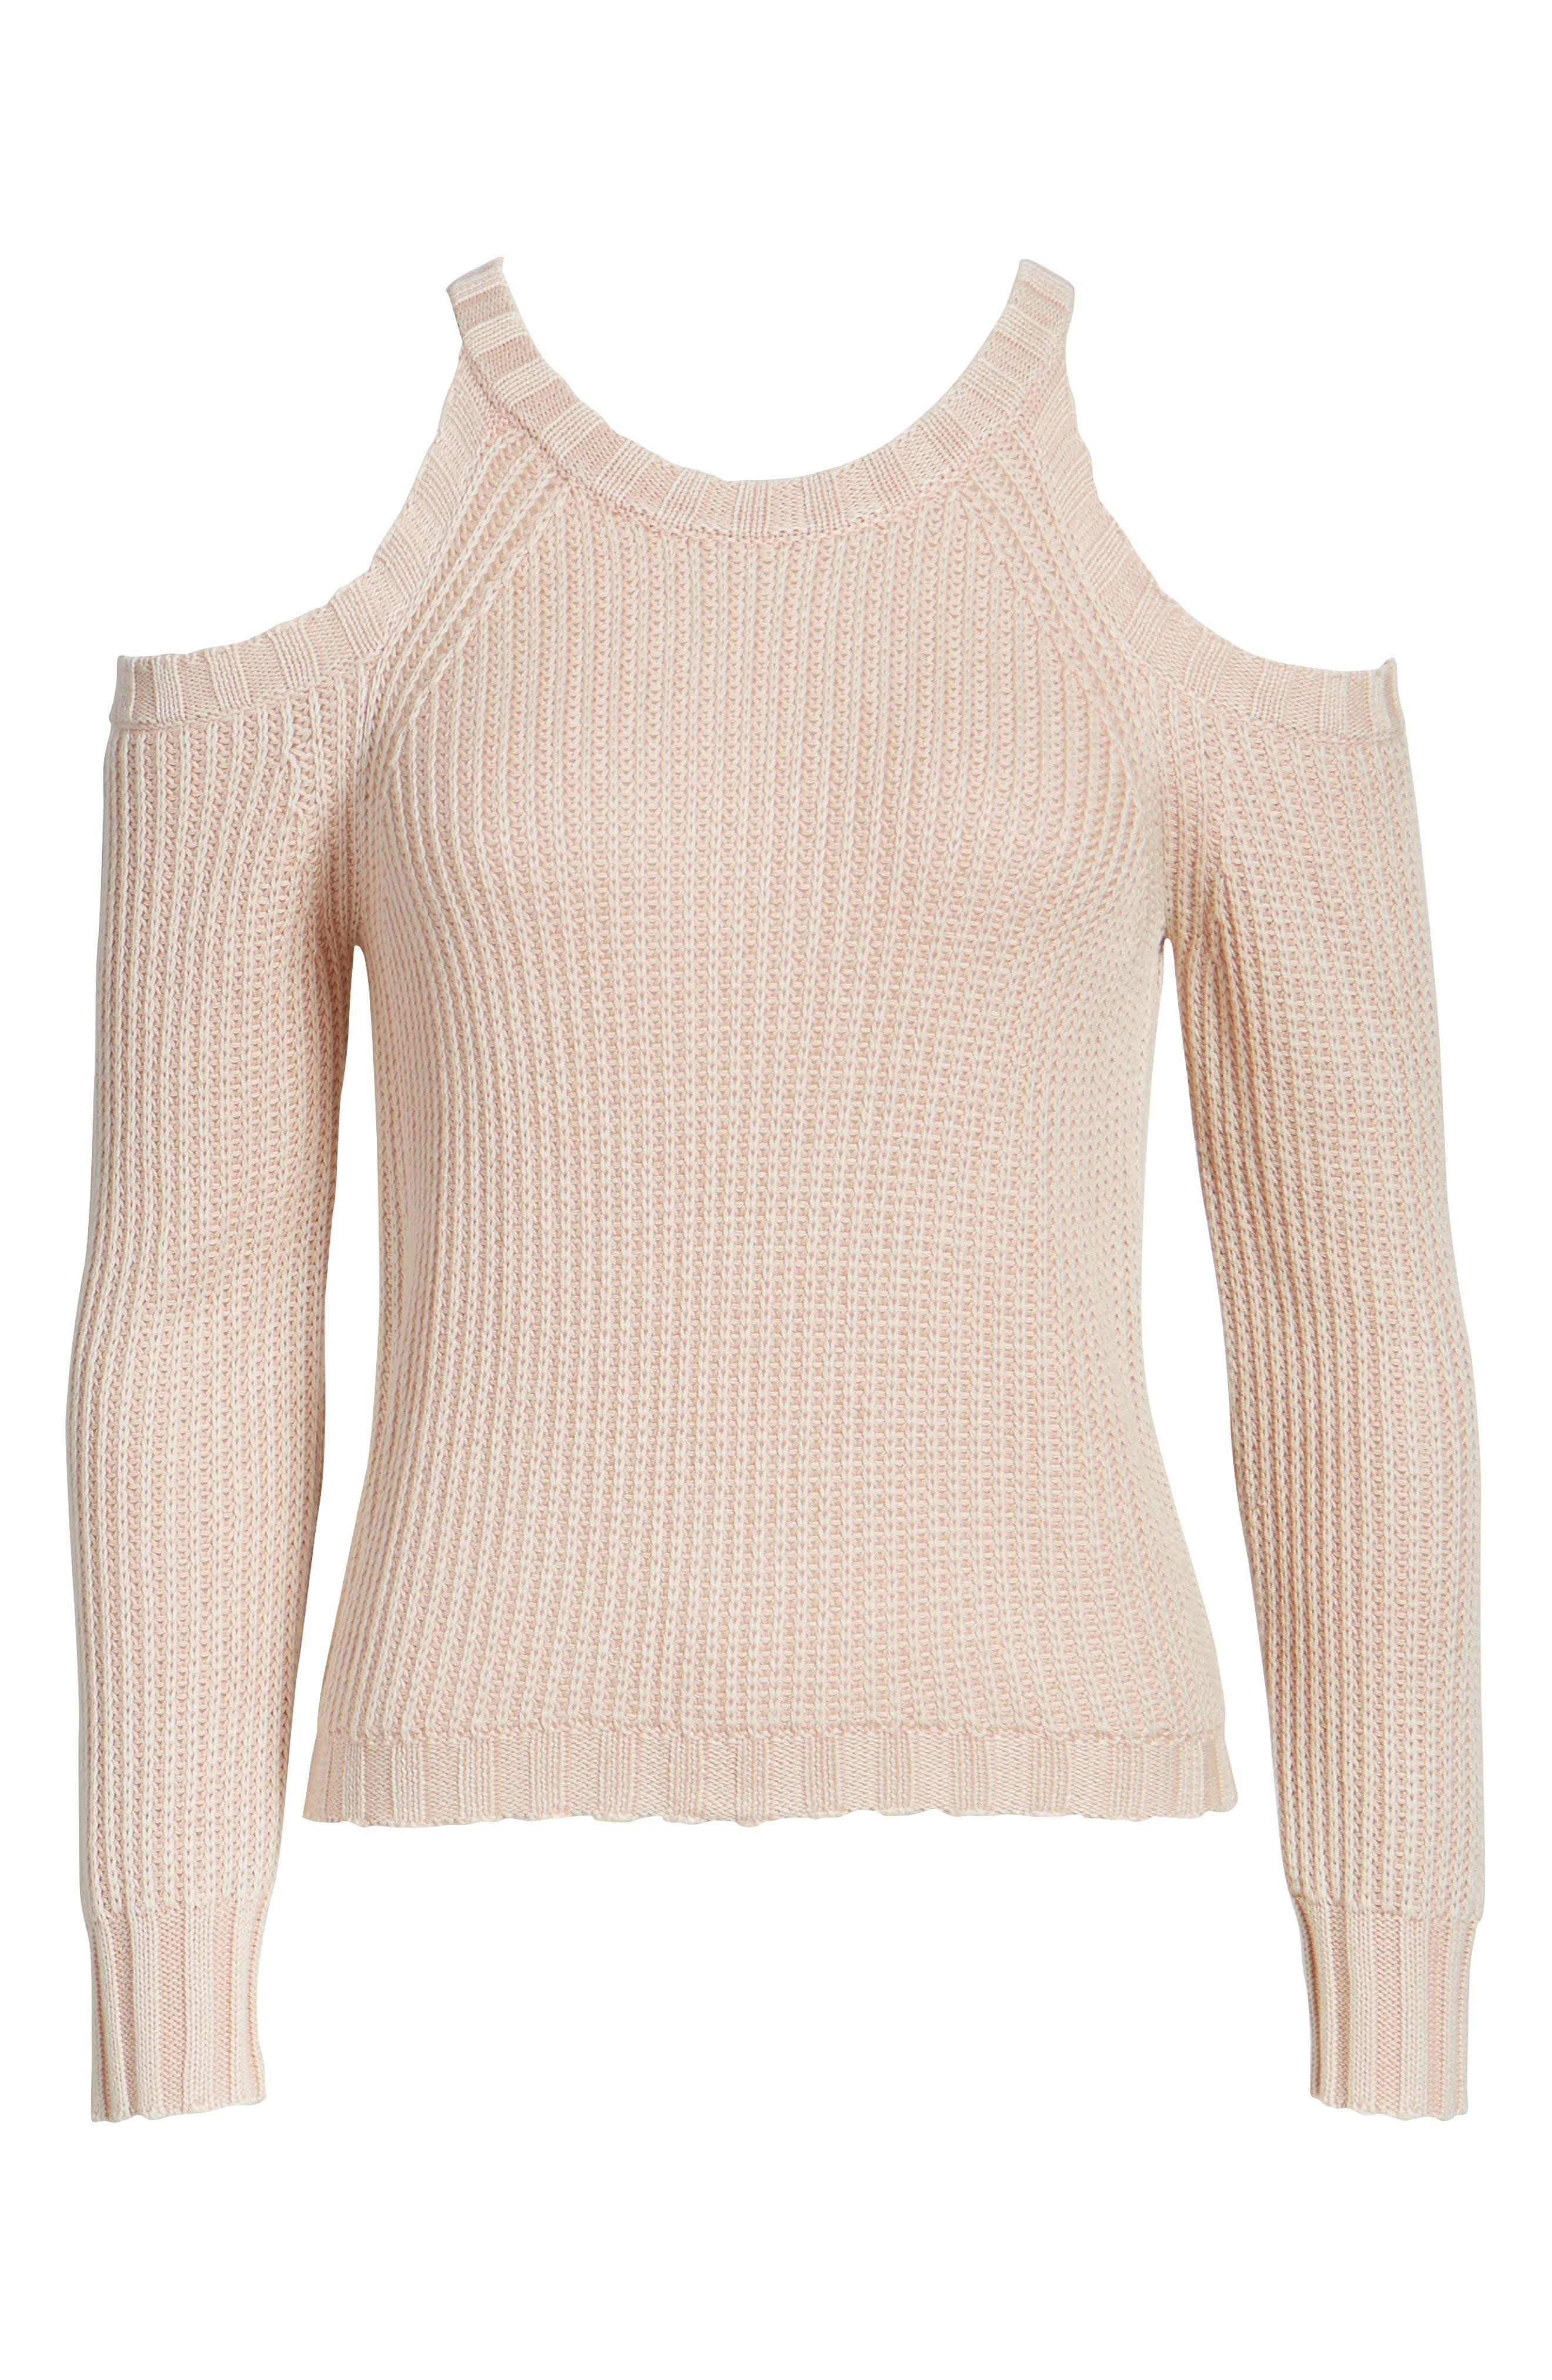 Mika Cold Shoulder Sweater,                             Alternate thumbnail 6, color,                             681